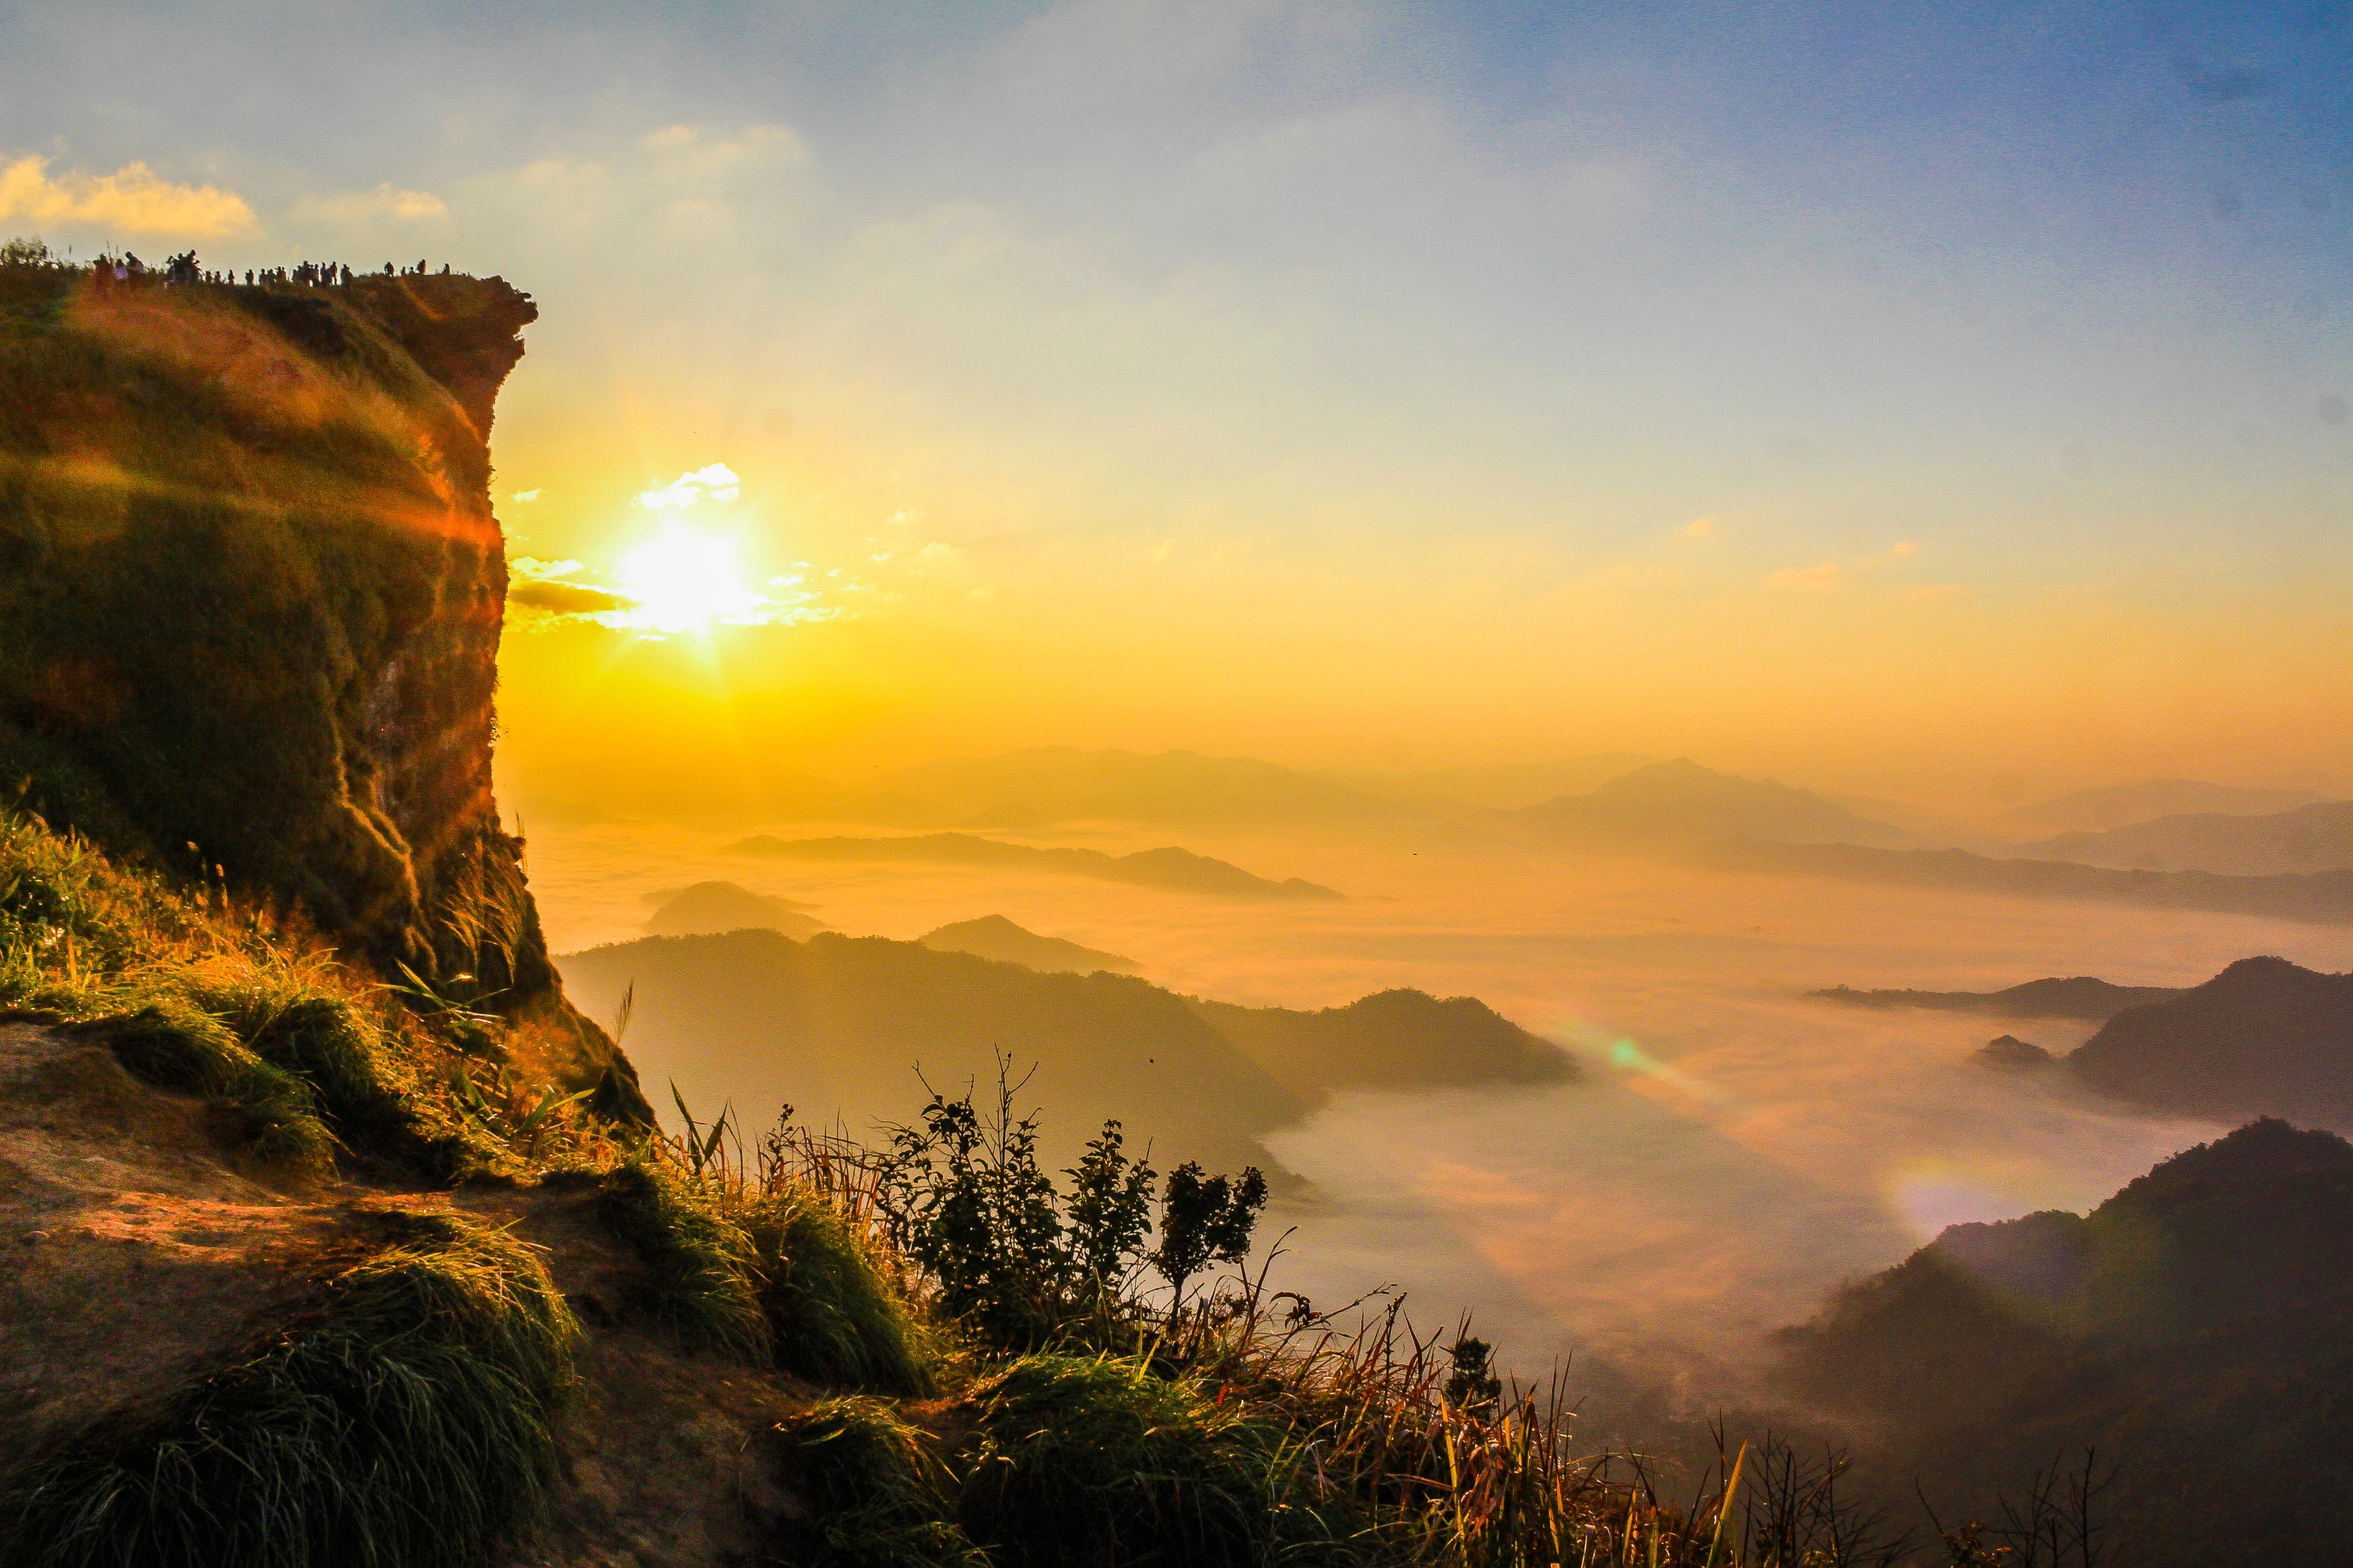 1000+ Great Nature Background Photos · Pexels · Free Stock Photos